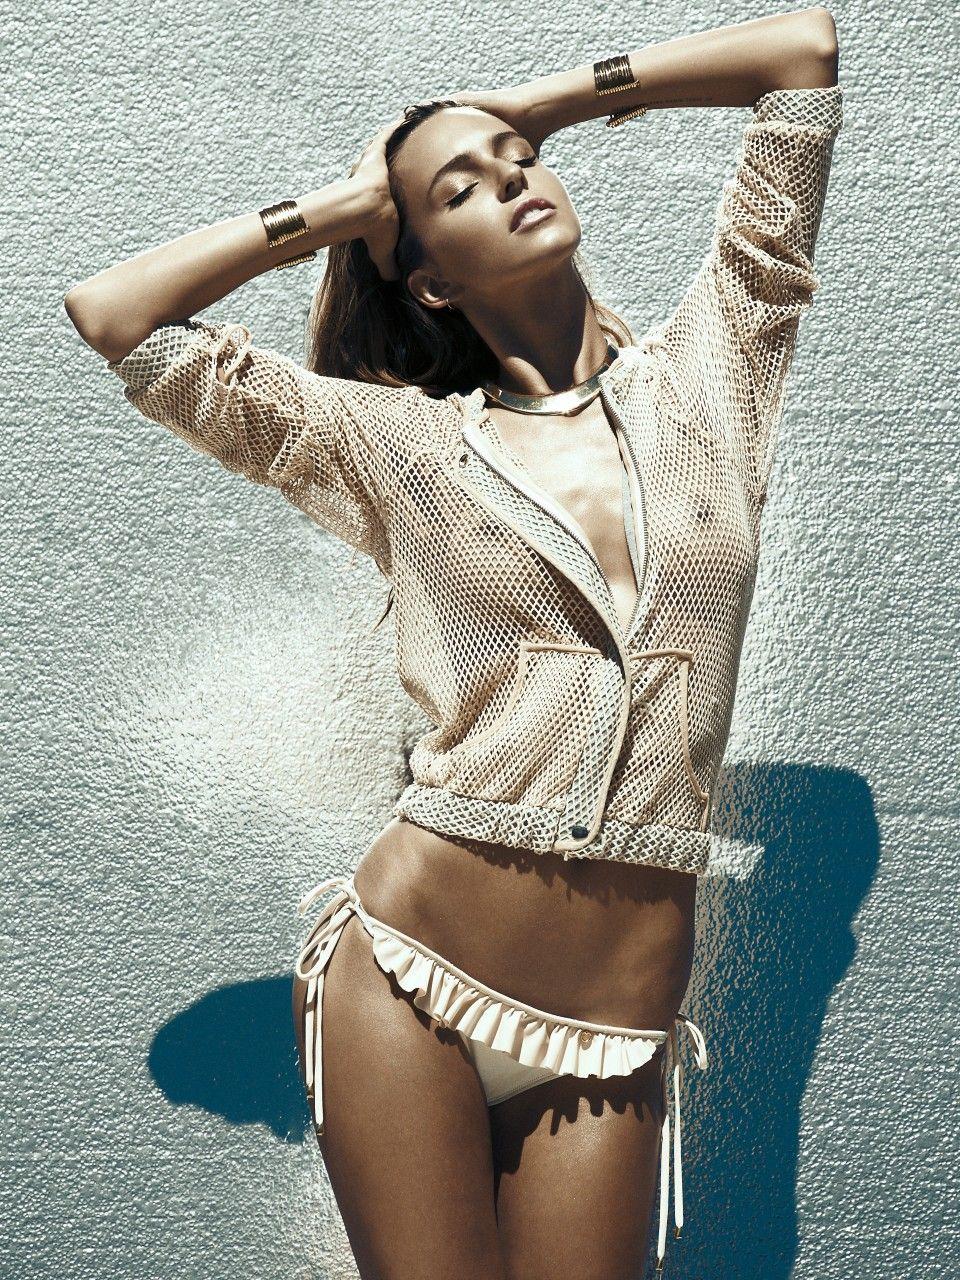 Amanda Marie Pizziconi nude (79 images) Cleavage, Instagram, cameltoe